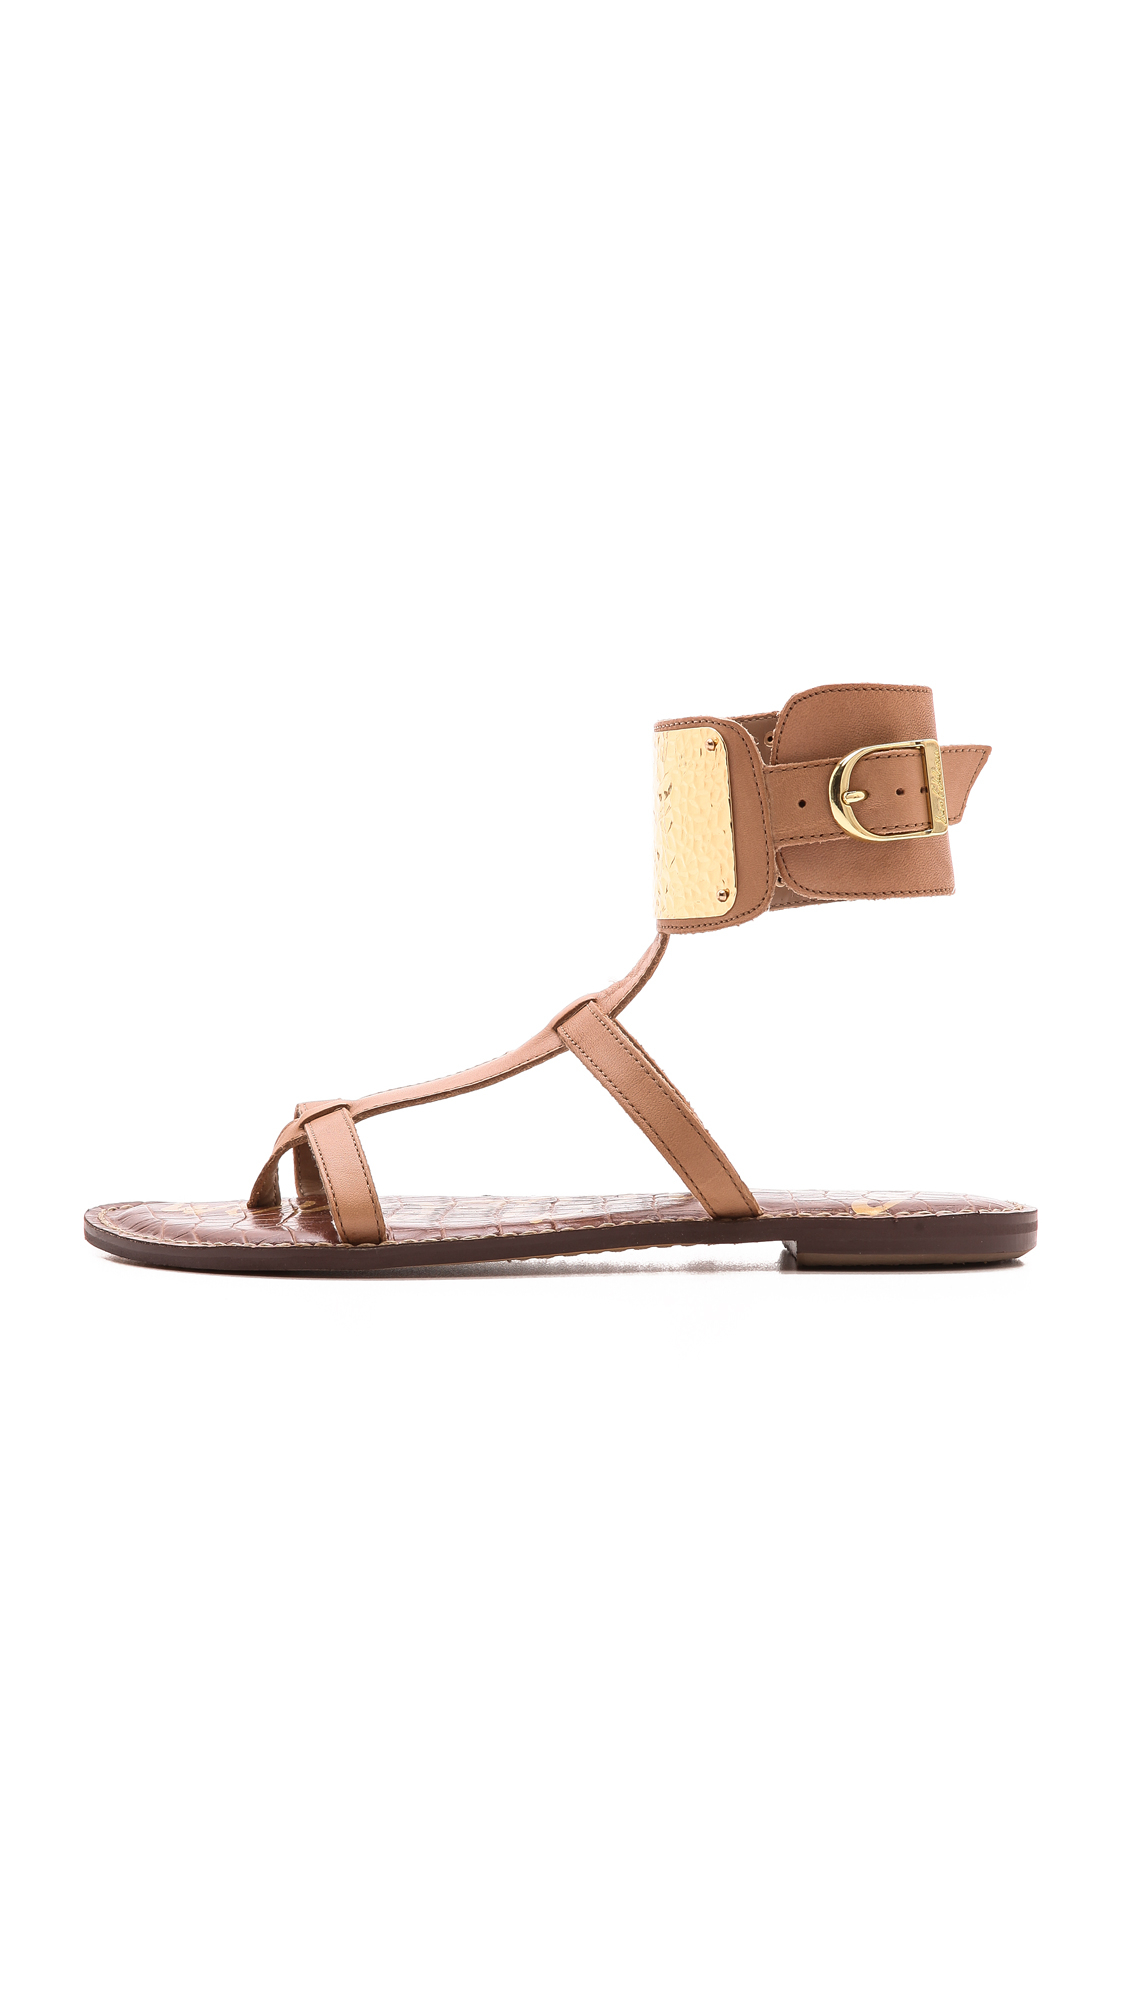 a483b4c2c4c6 Lyst - Sam Edelman Genette Ankle Cuff Sandals Classic Nude in Brown